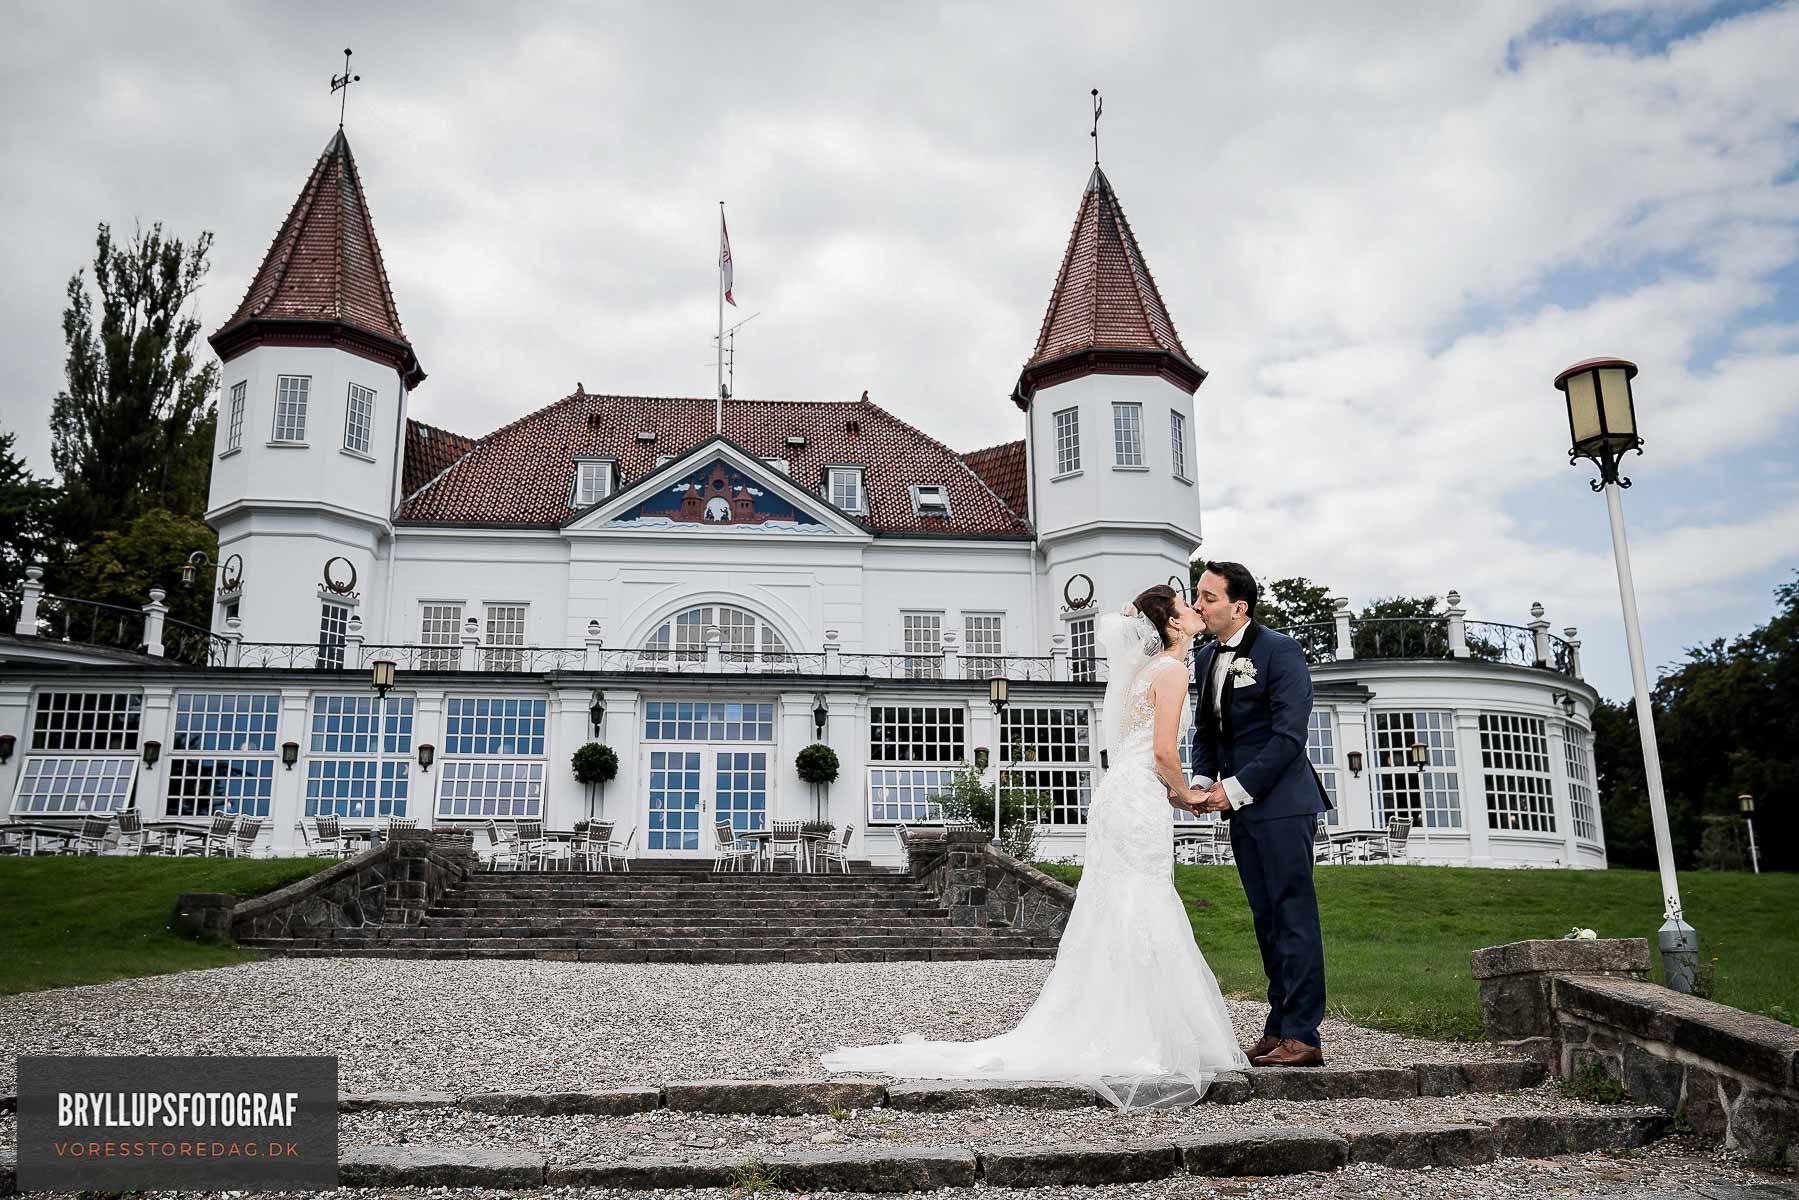 Bryllupsfotograf i Aarhus